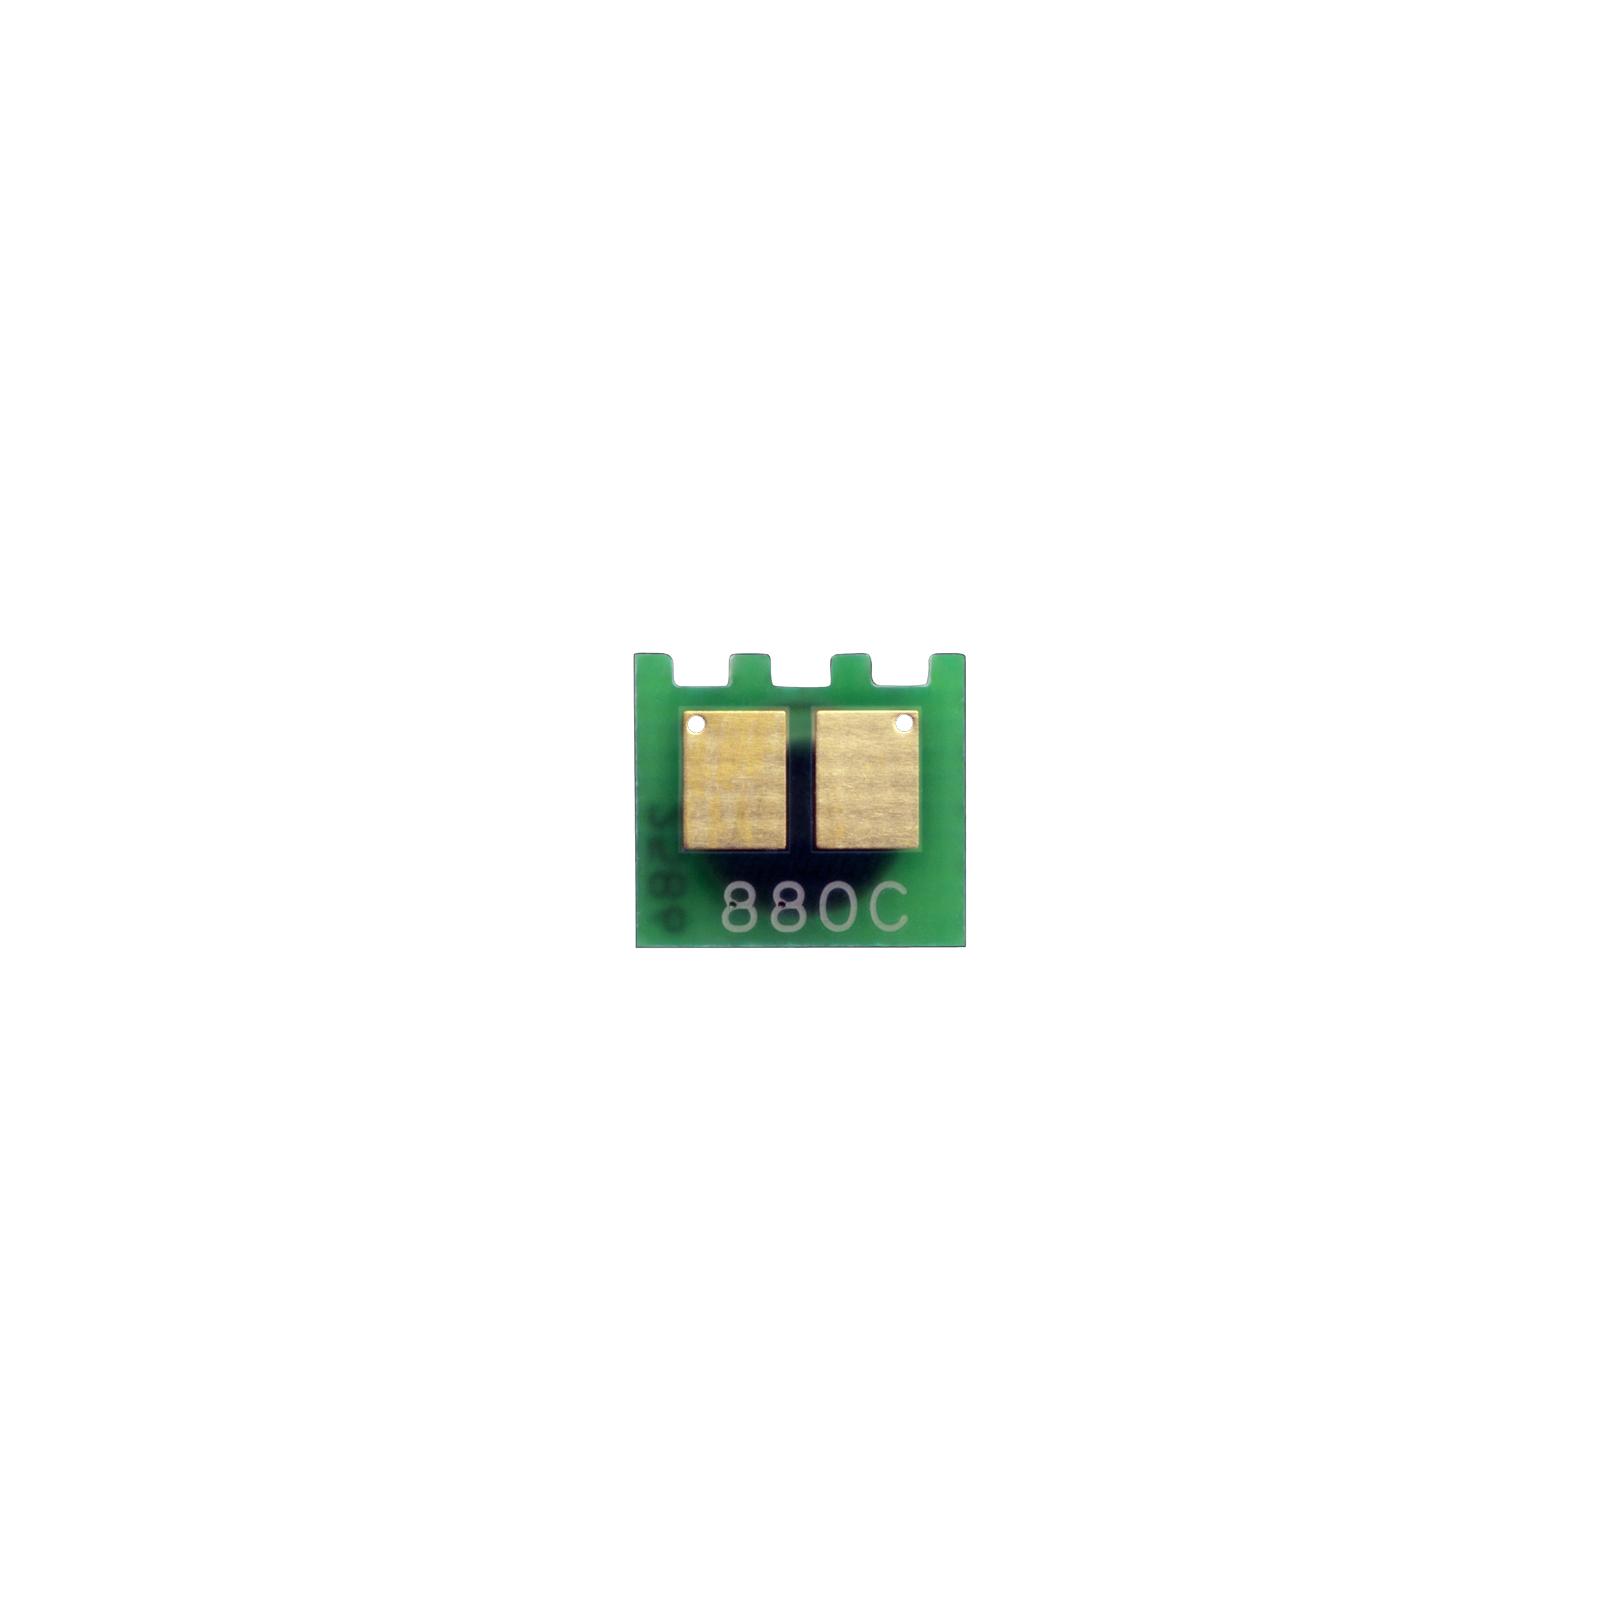 Чип для картриджа HP CLJ M880 (CF301A) 32k cyan Static Control (HP880CP-C)